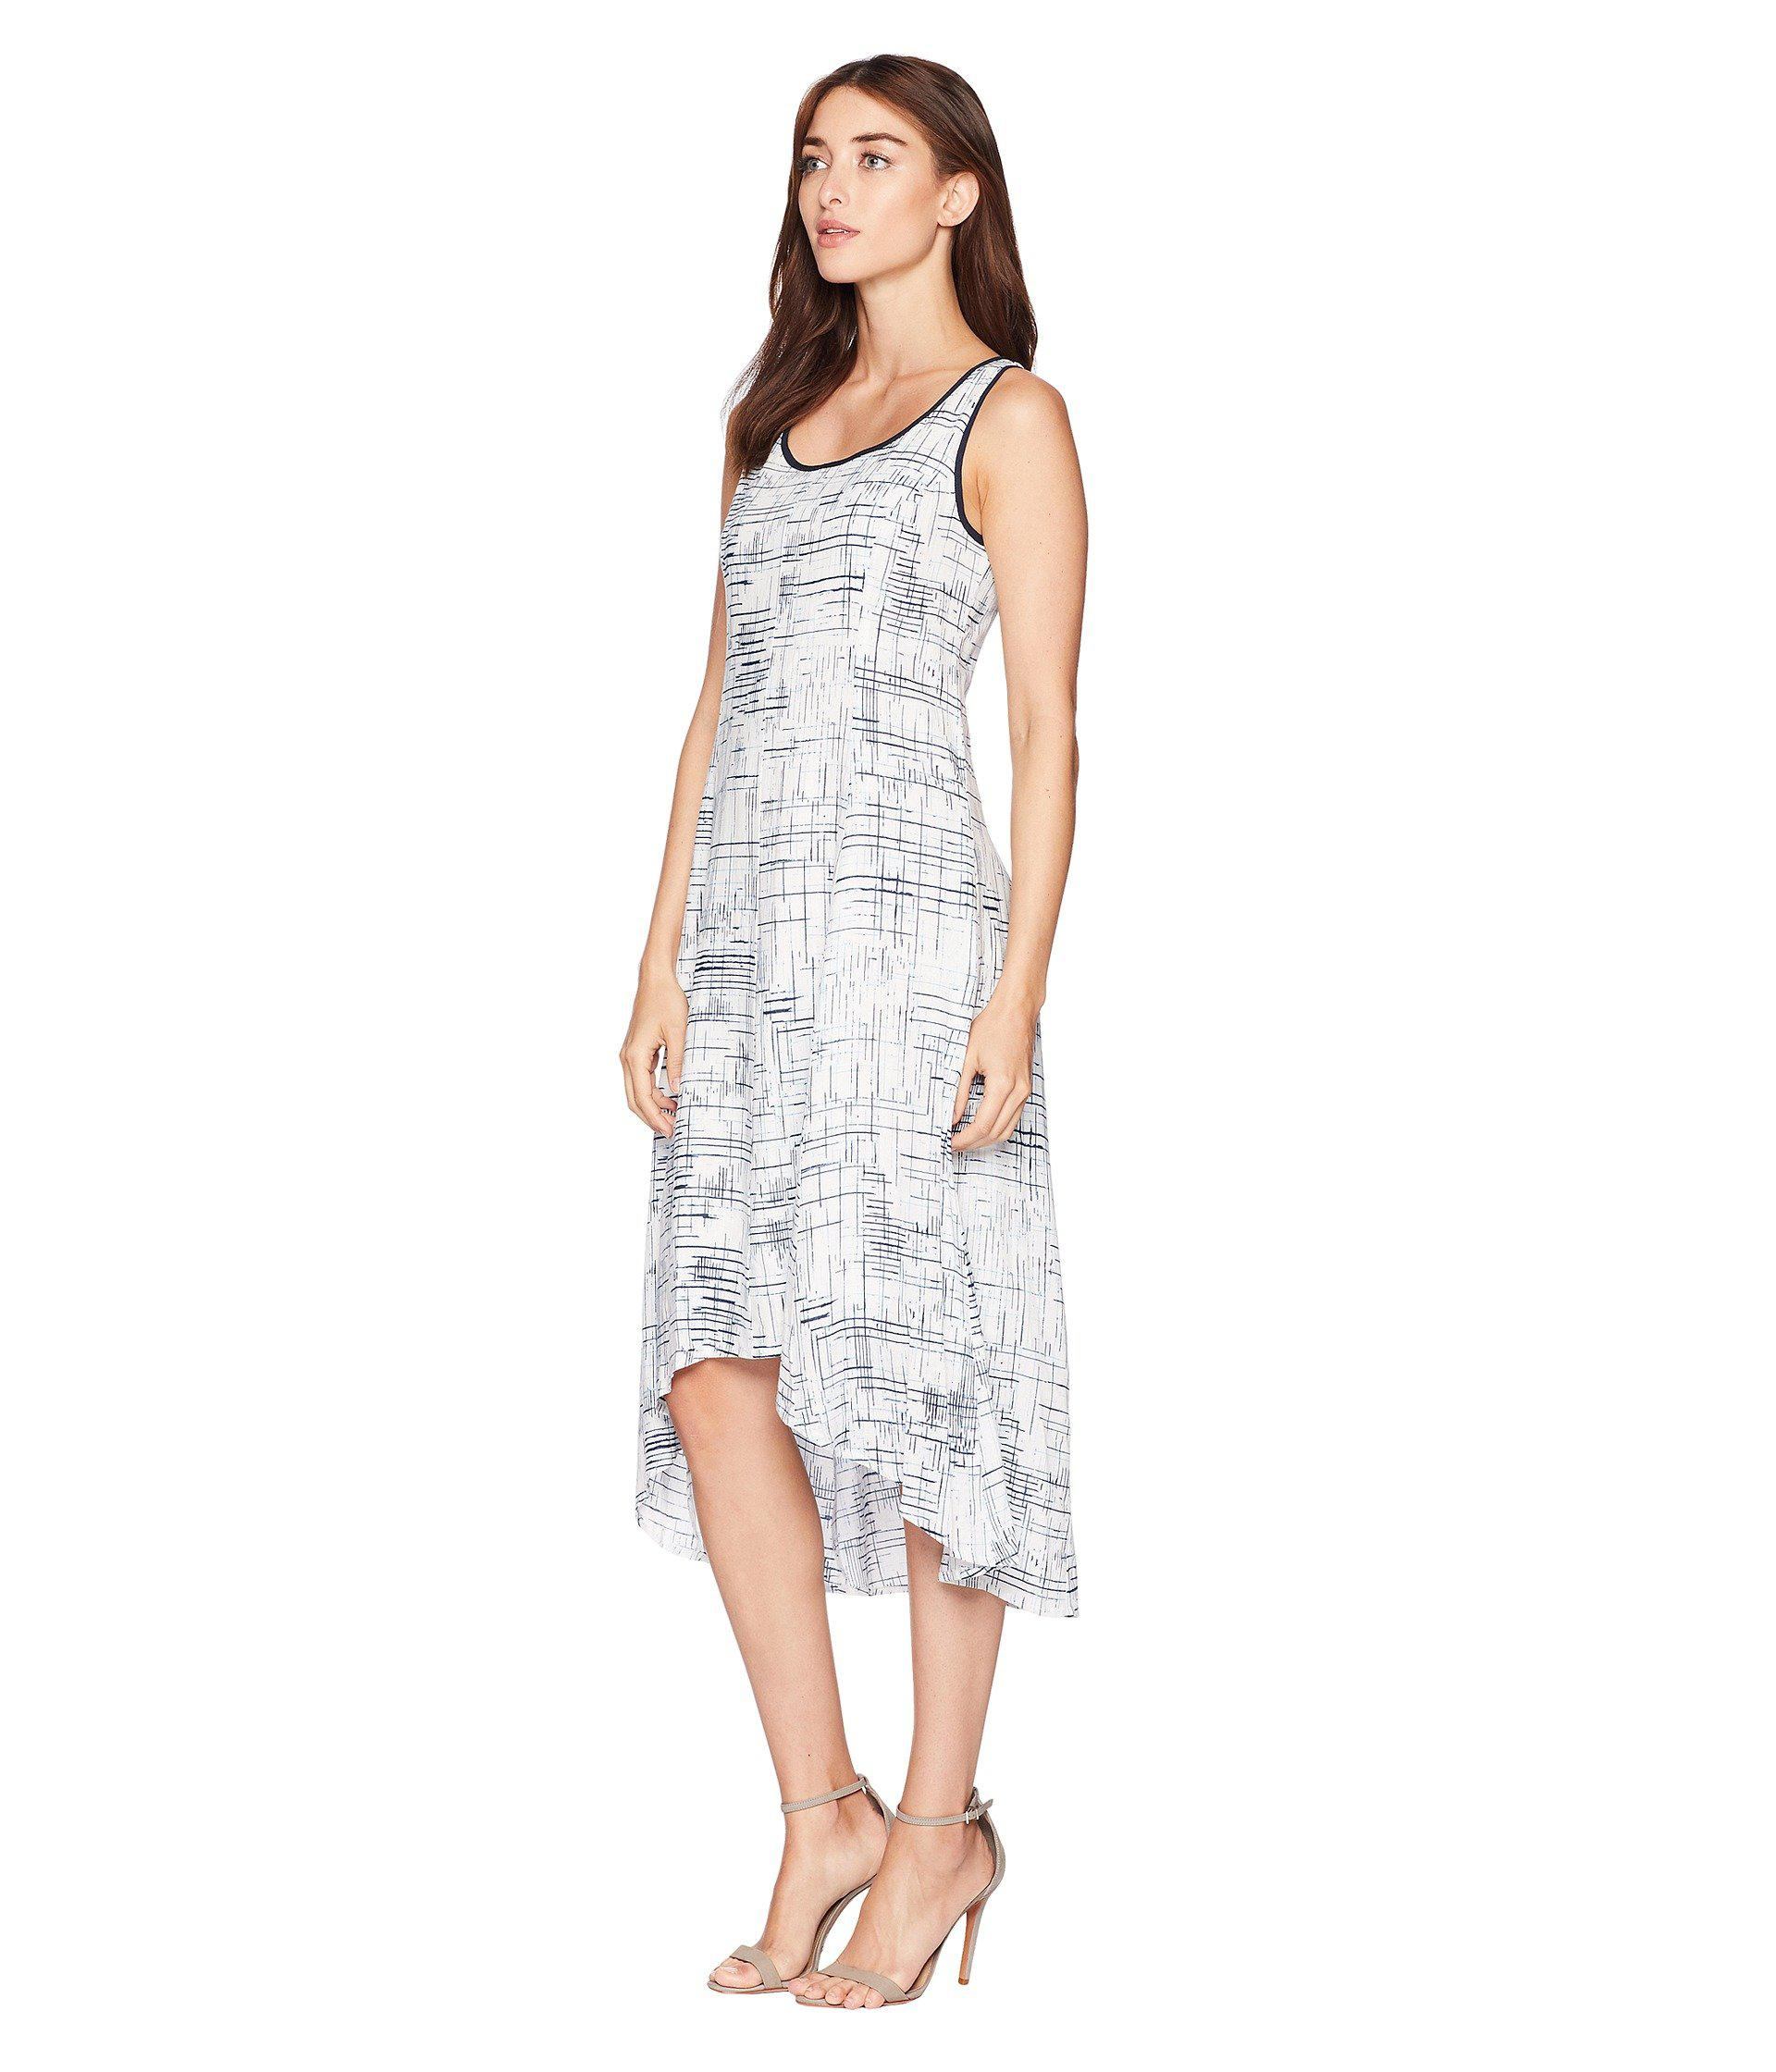 d0a8d3c03f0 Lyst - Jones New York Sleeveless Printed Linen High-low Hem Dress in White  - Save 76%